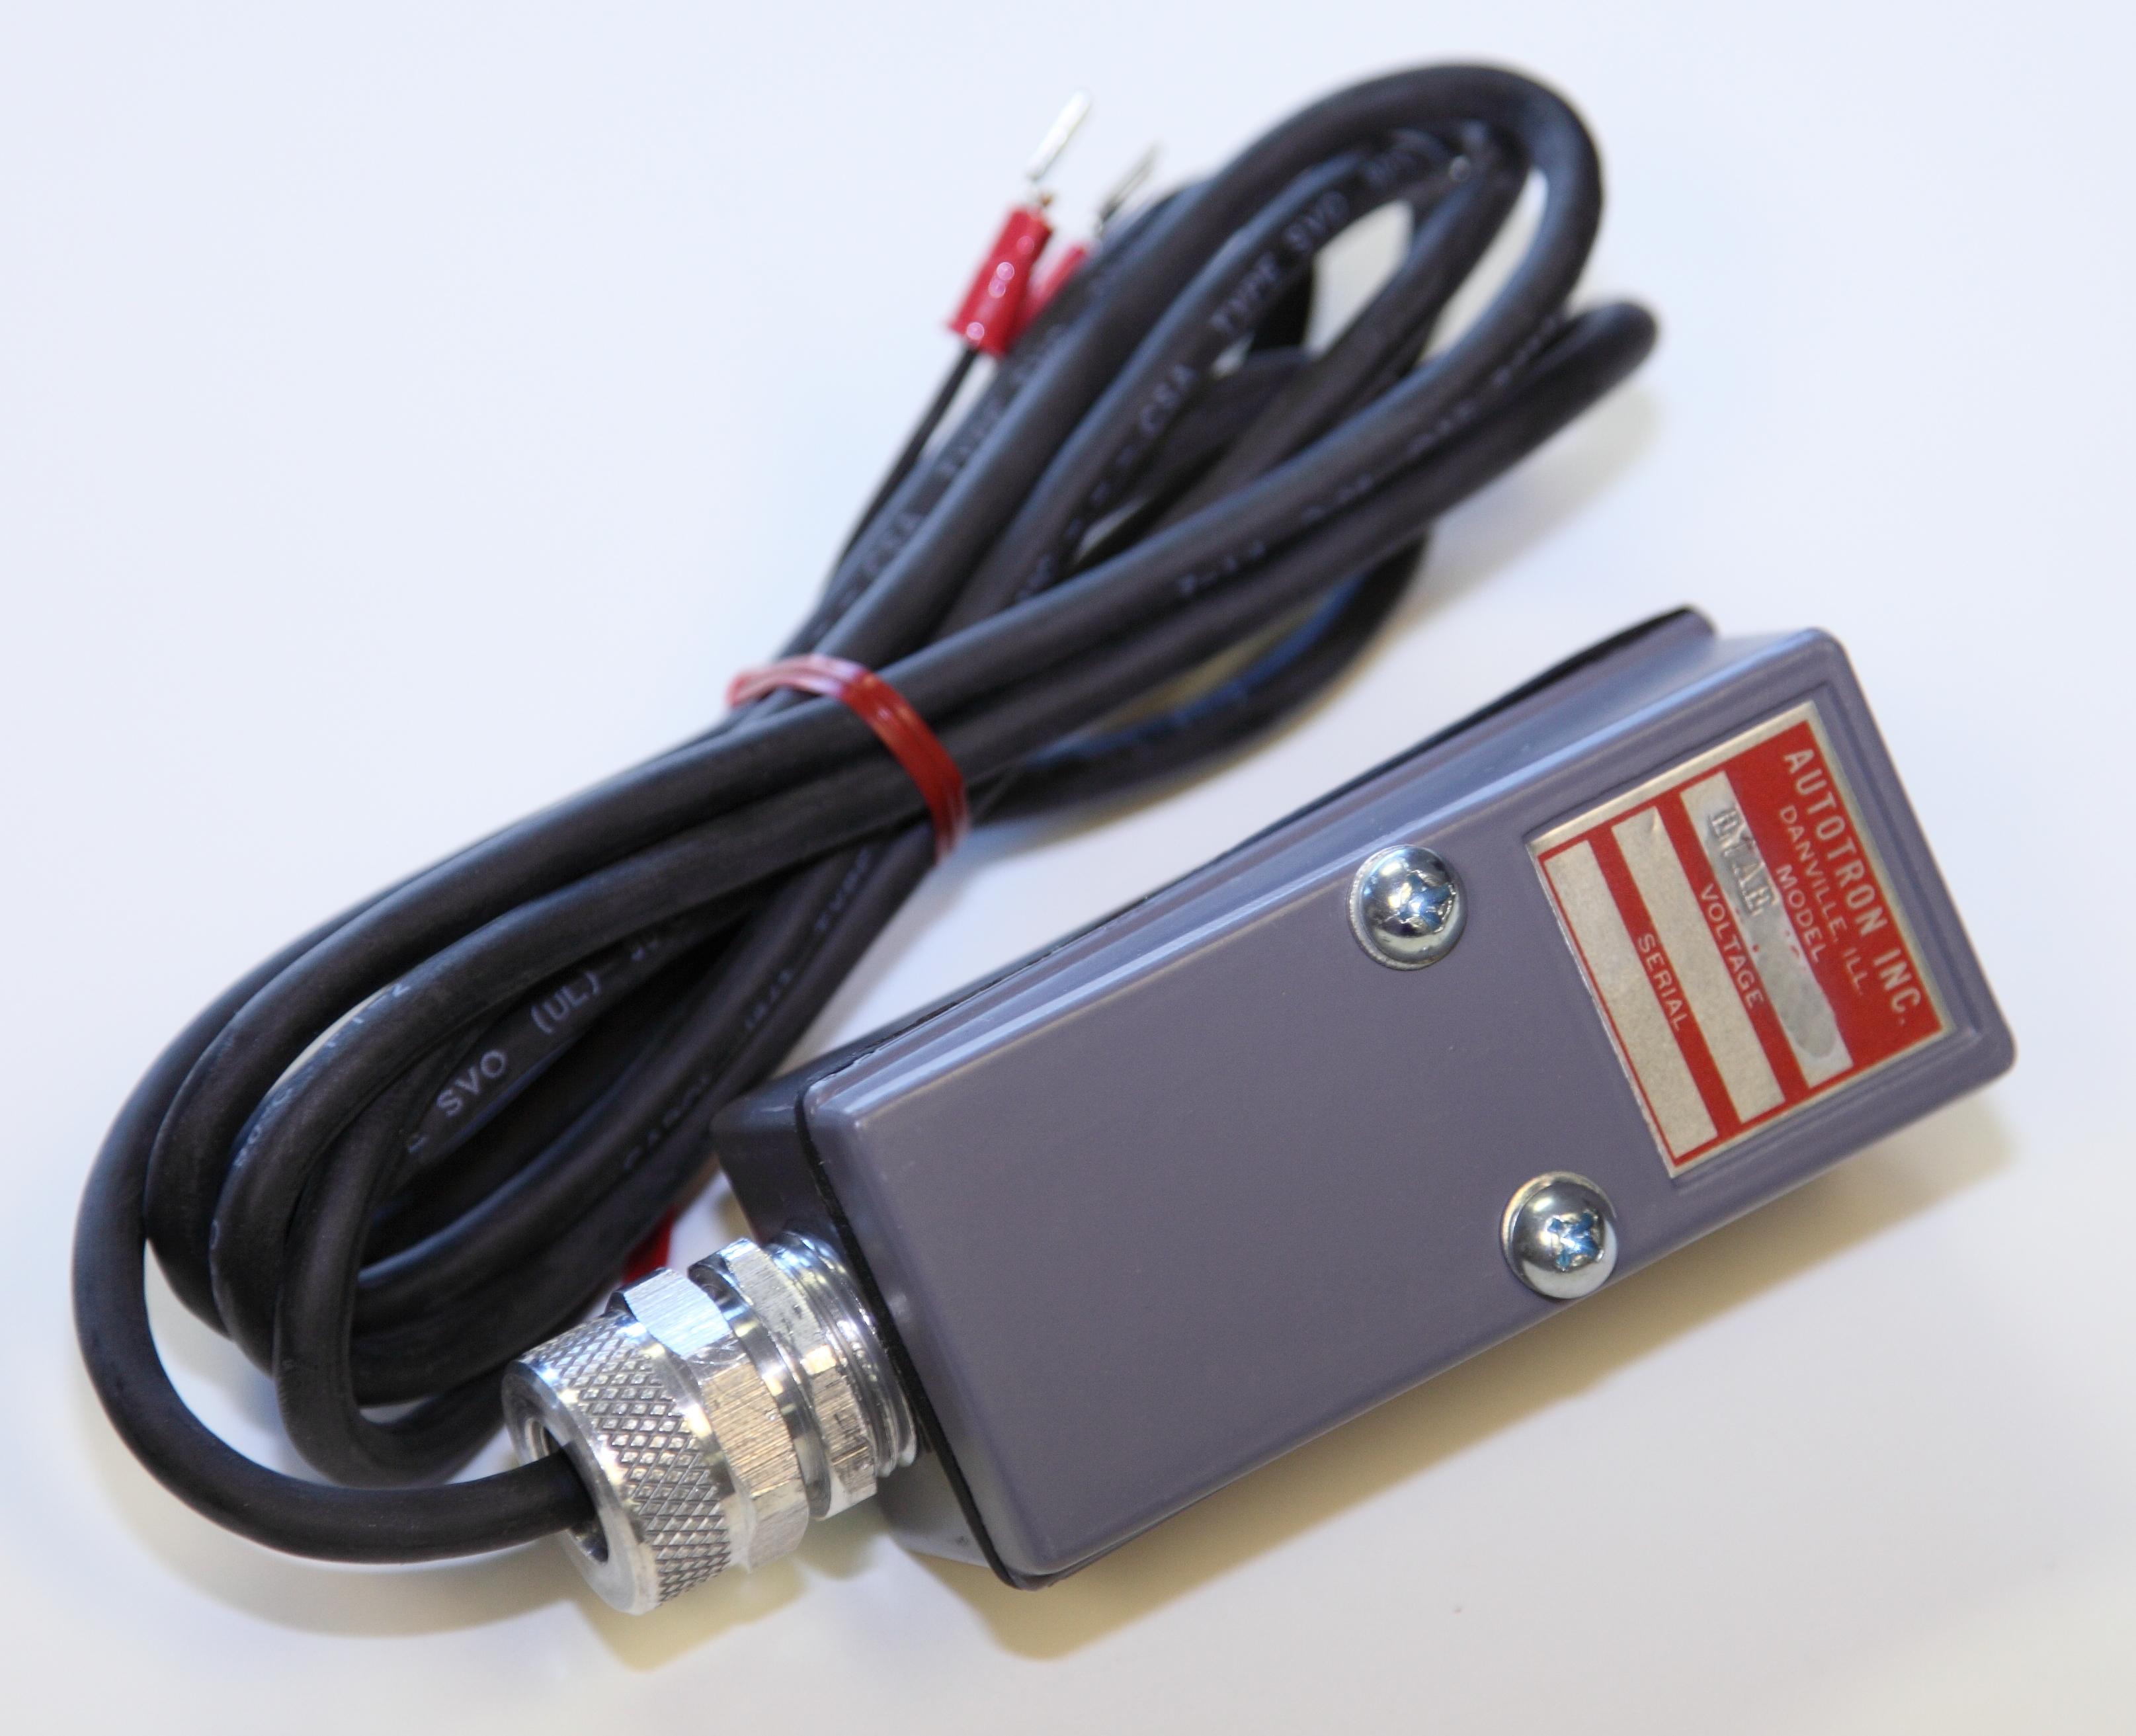 drivers speedtouch 121g wireless